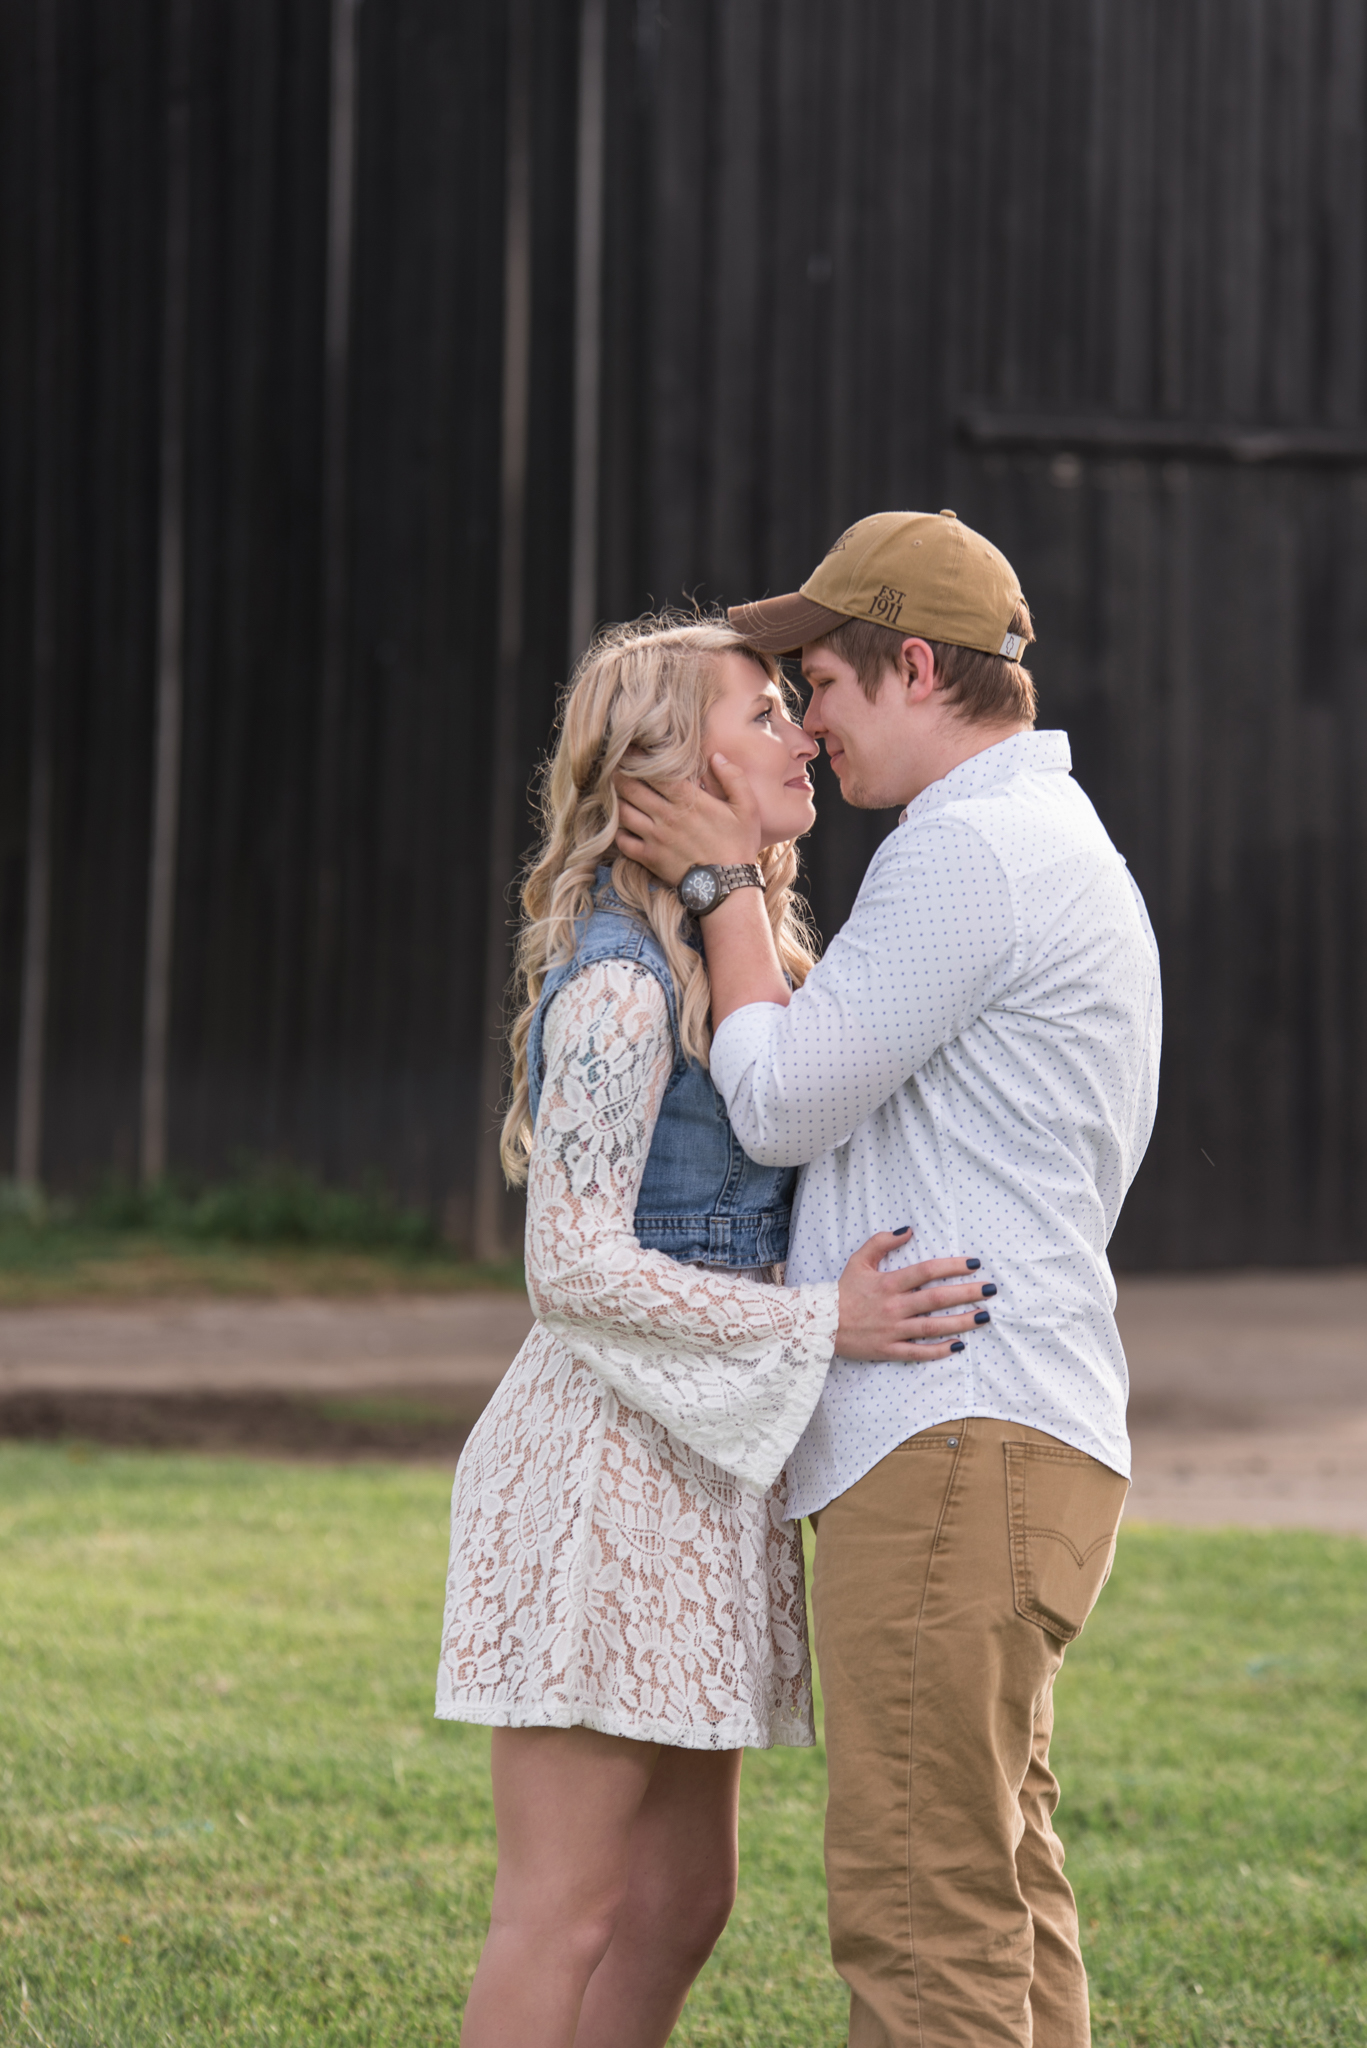 Lexington KY engagement photography of happy couple